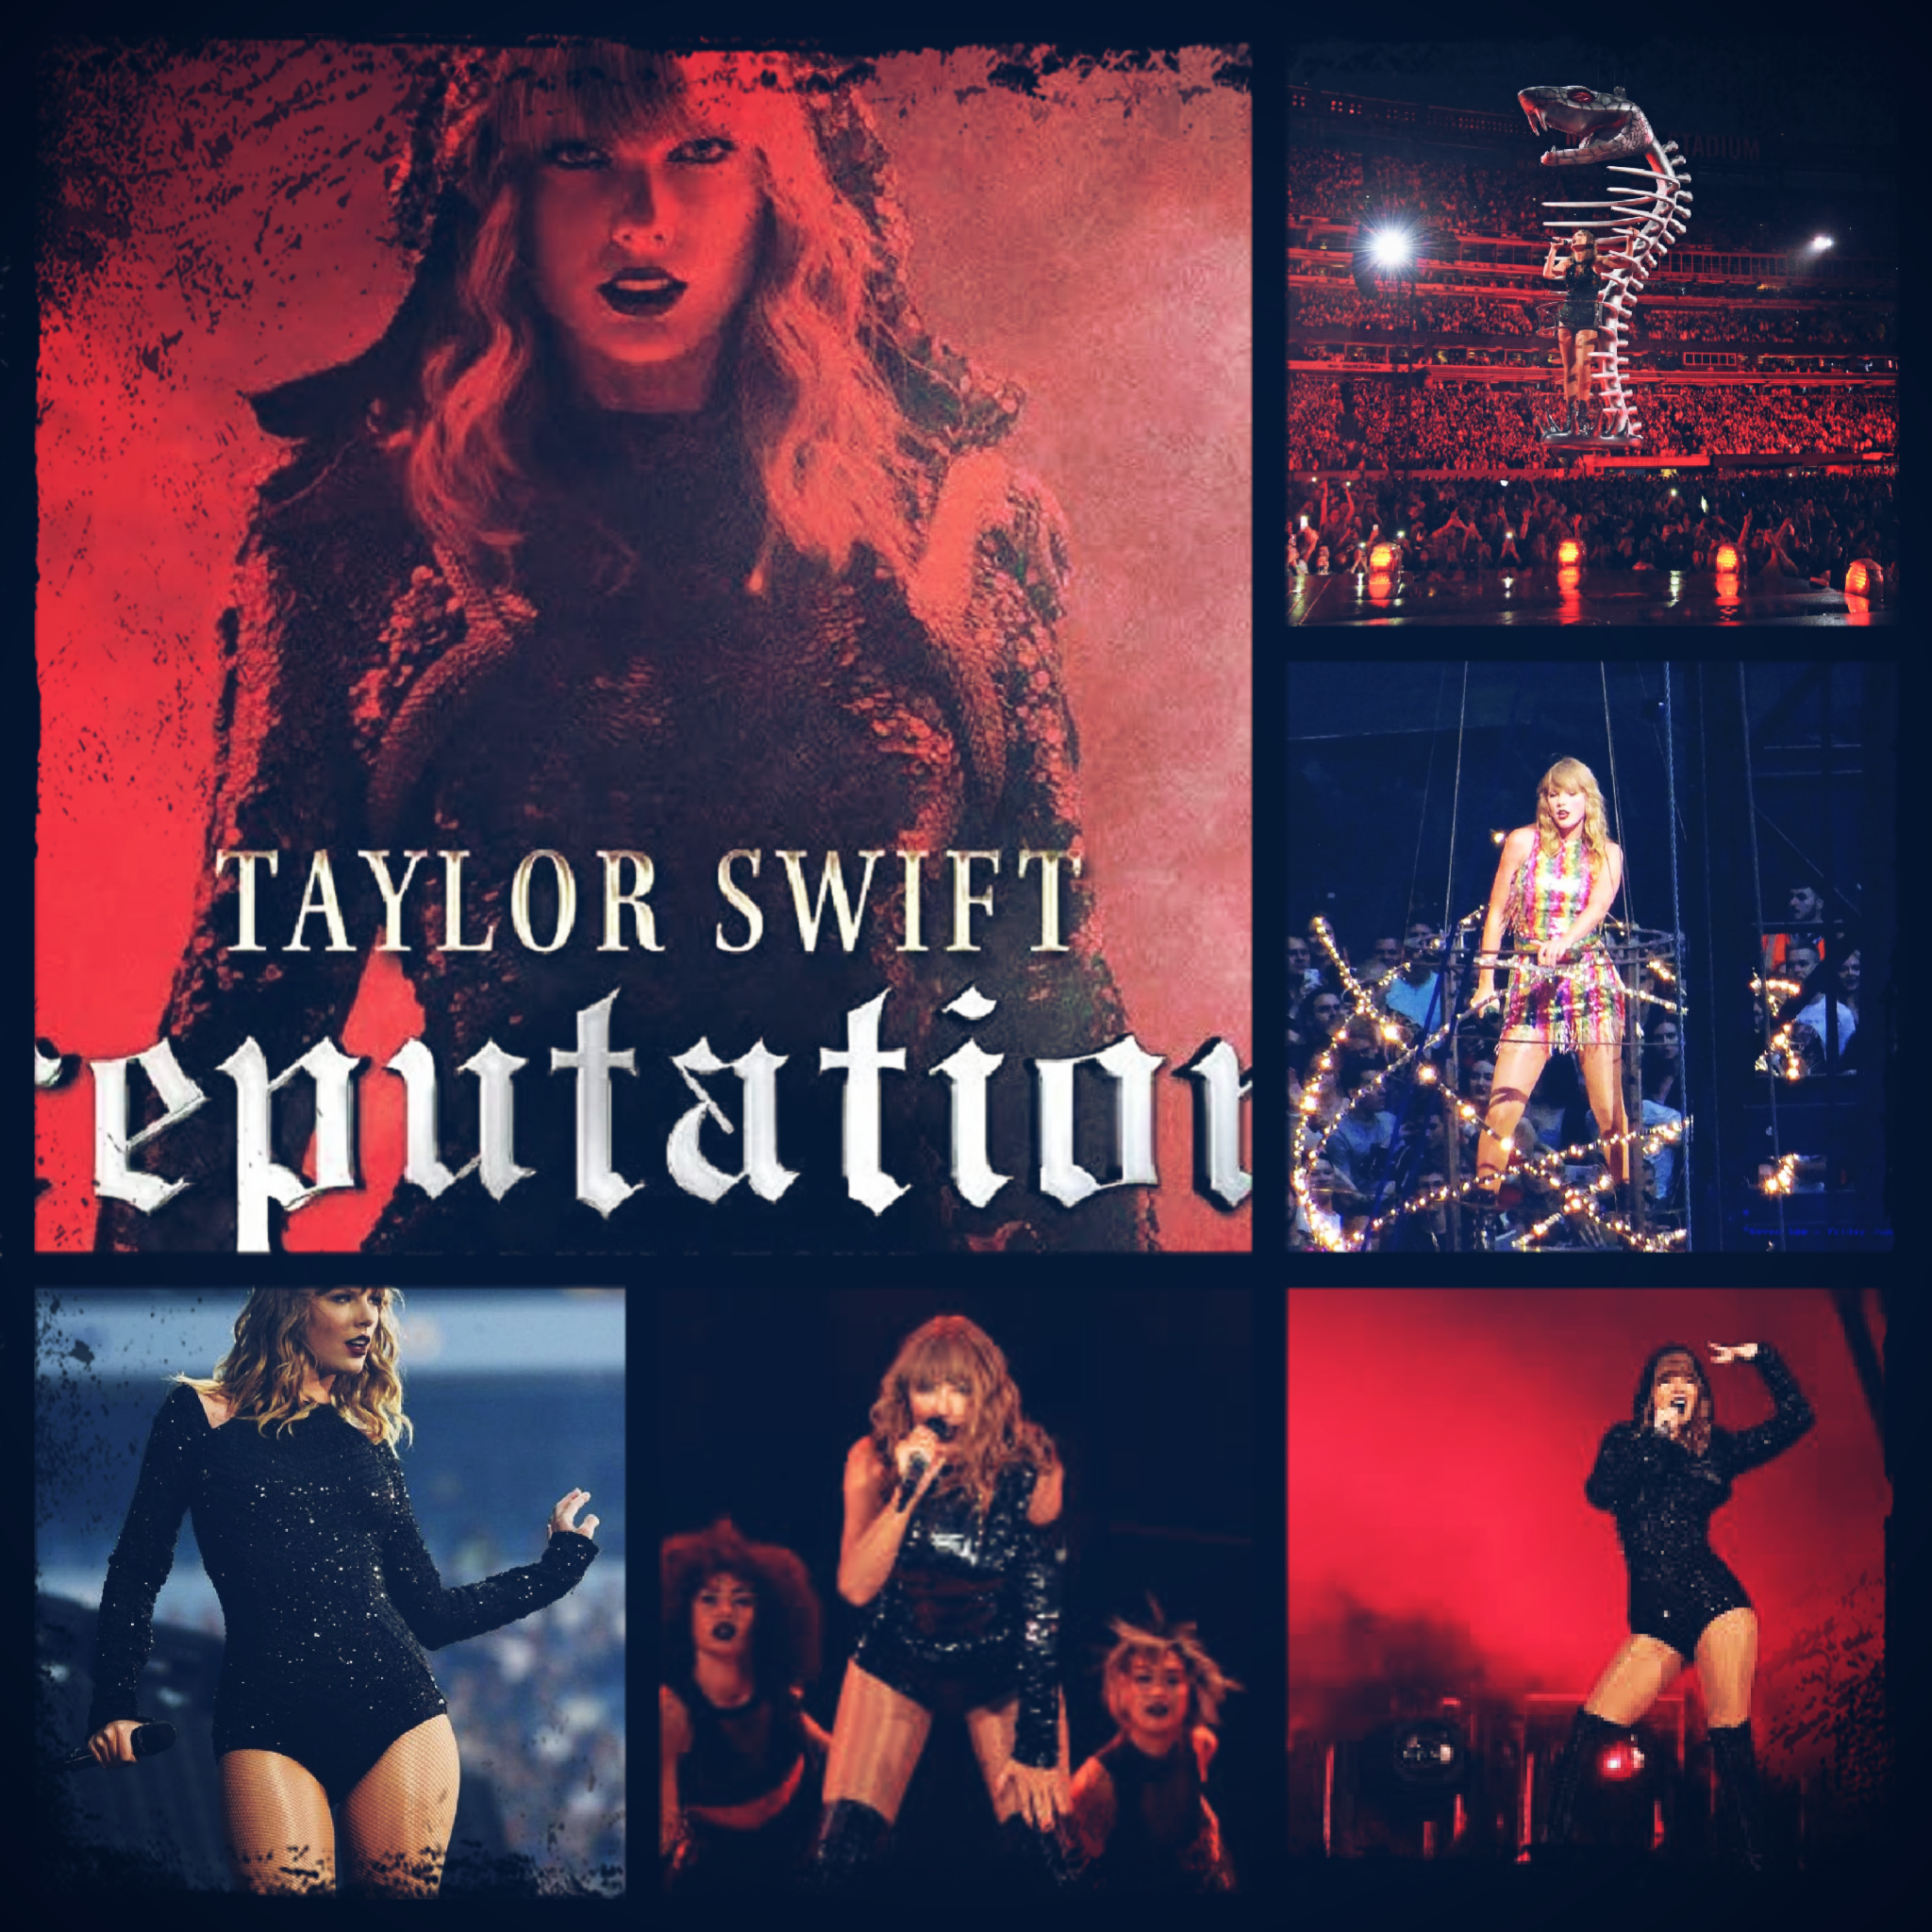 Reputationstadiumtour Taylorswiftedit In 2020 Taylor Swift Discography Taylor Swift Blog Tutorials